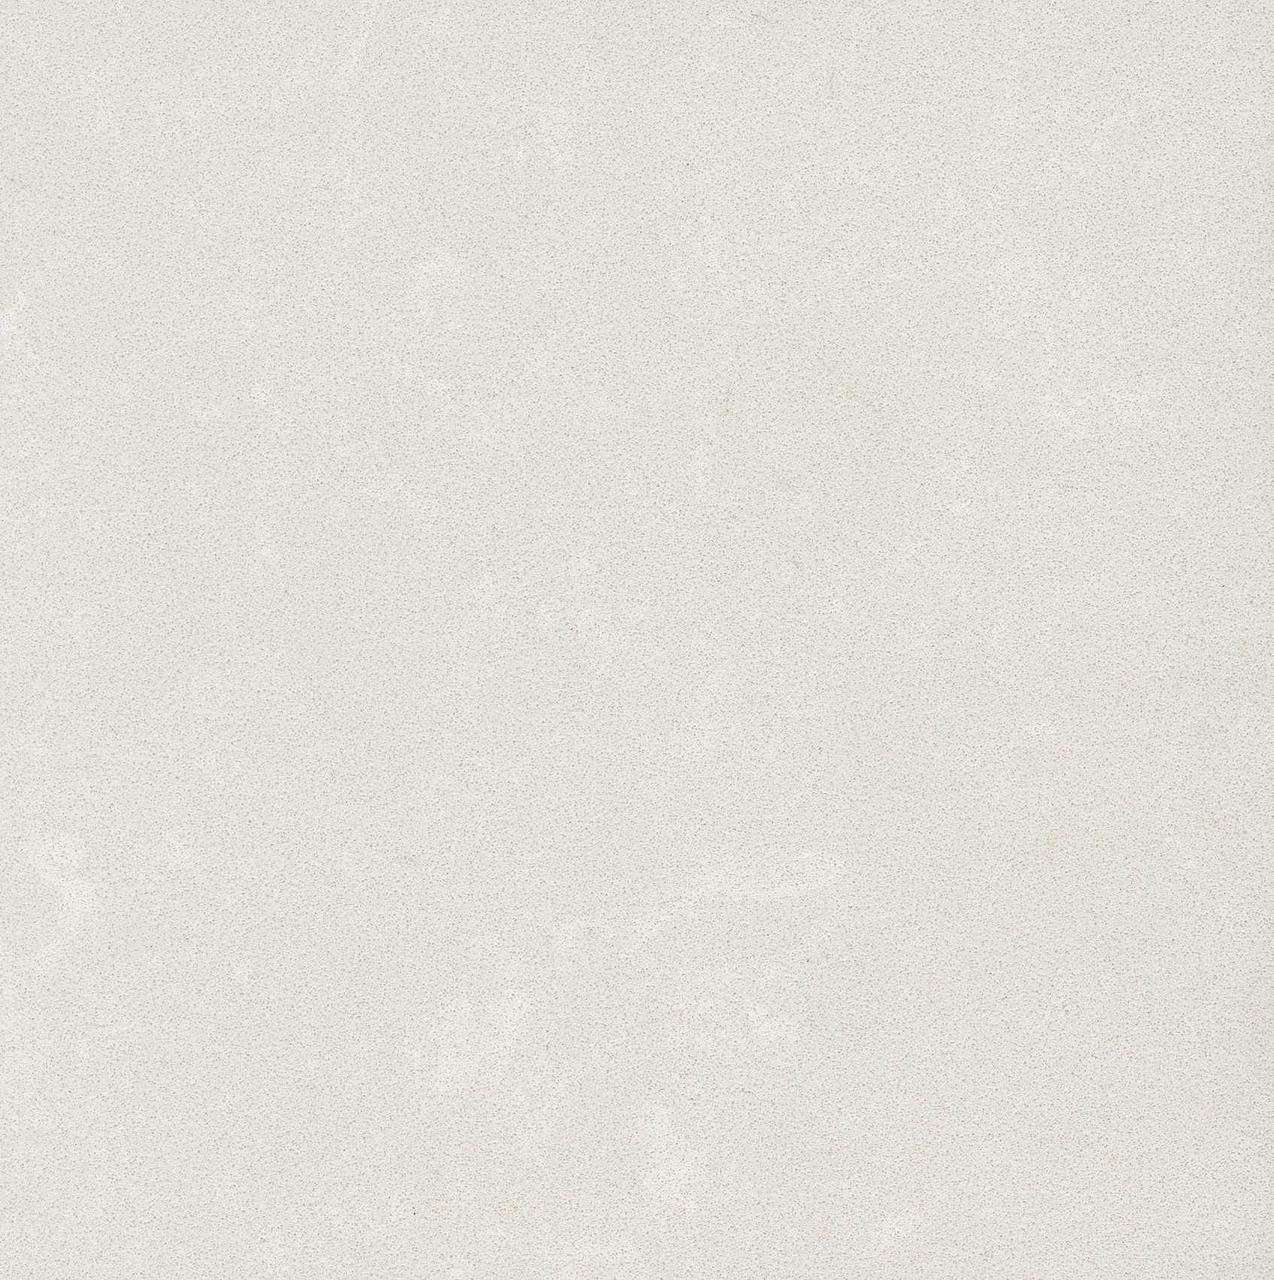 Искусственный камень, Кварц Silestone Yukon 20 мм